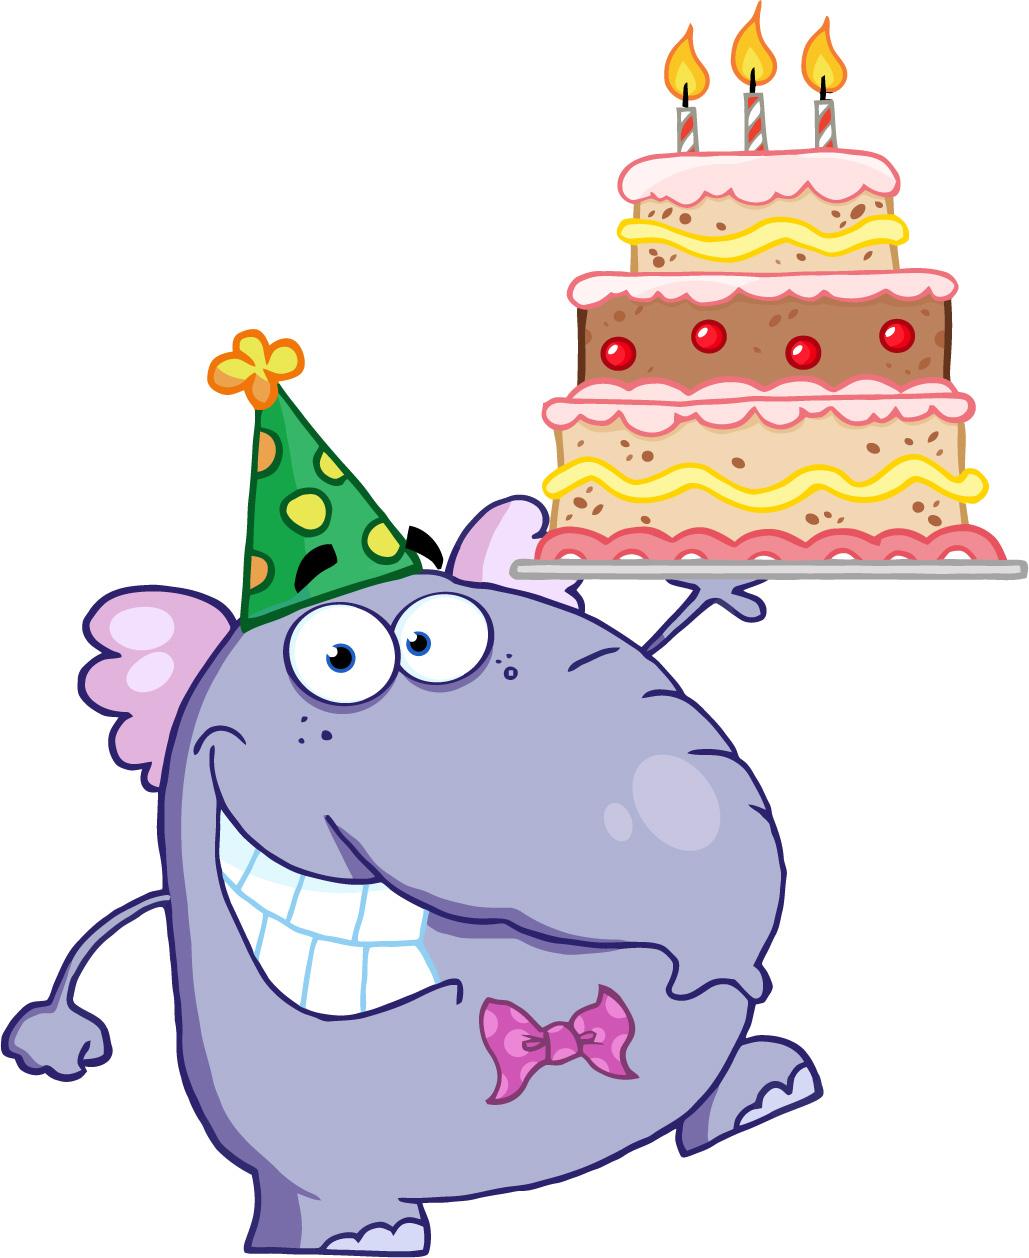 Jpg Cartoon Elephant Birthday Cake Faserfimmel De